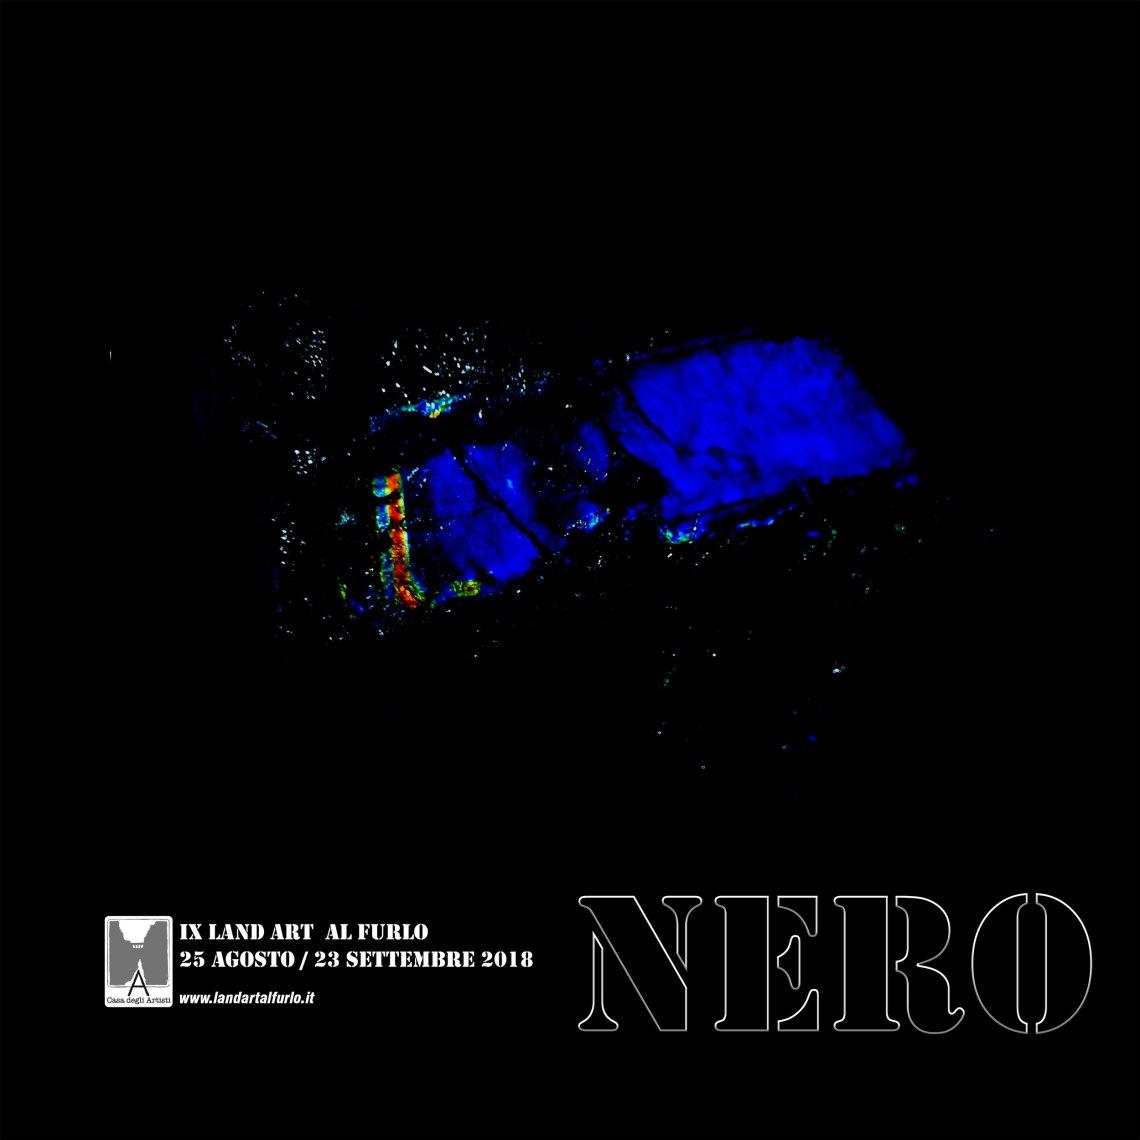 2018-NERO-IX-LAND-ART